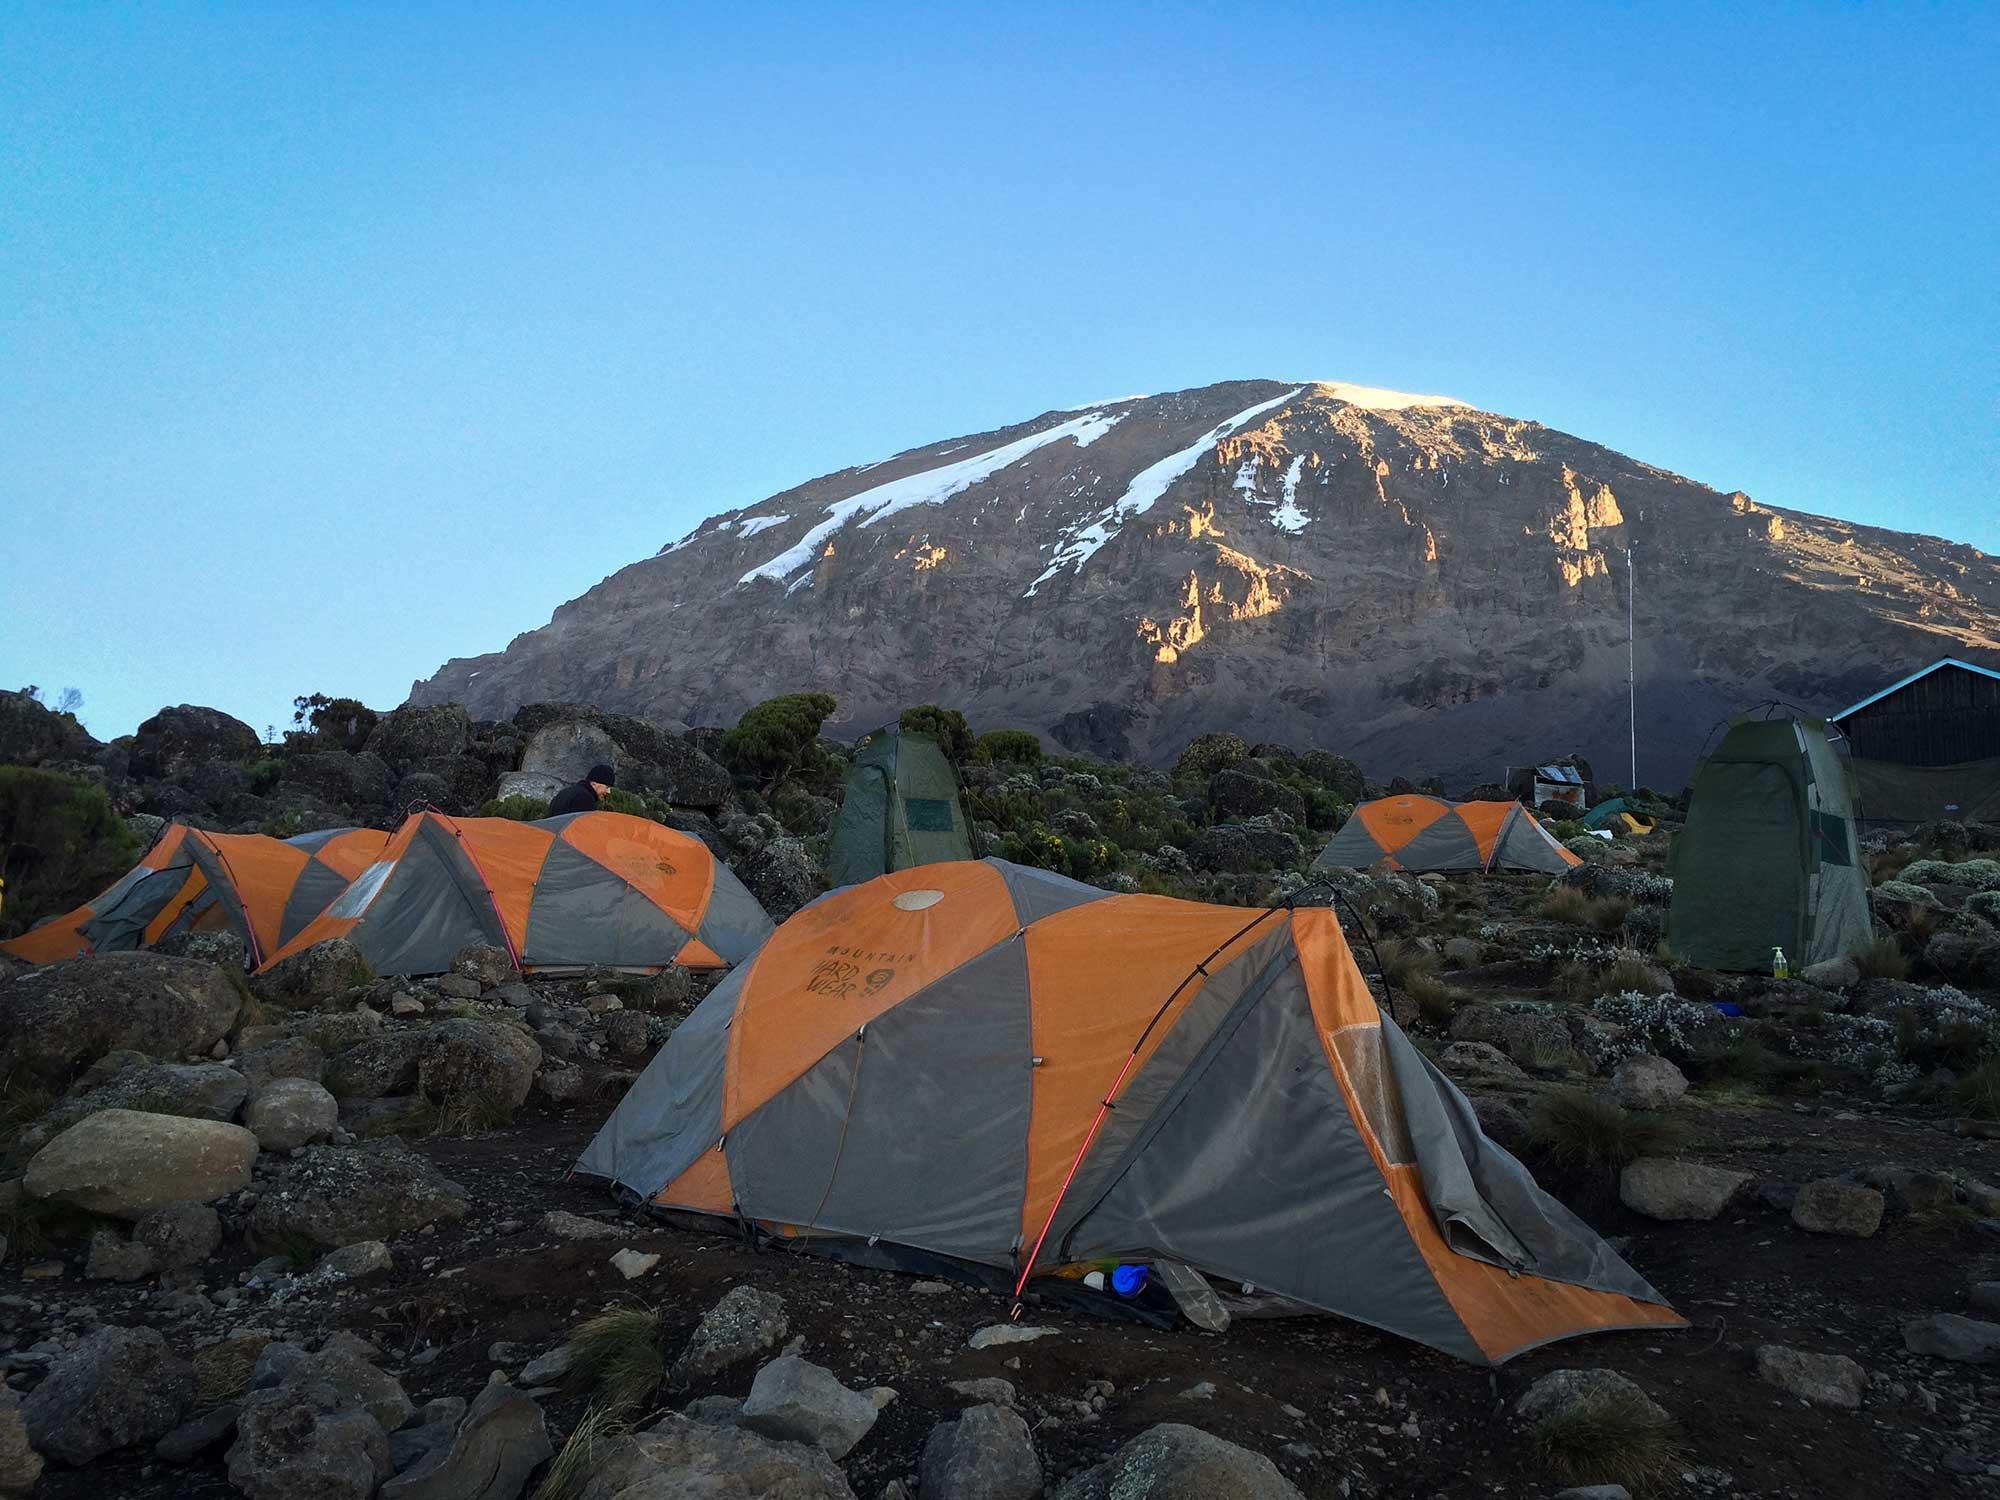 D6-16-tents-nestled-between-rocks-karanga-camp-kilimanjaro.jpg